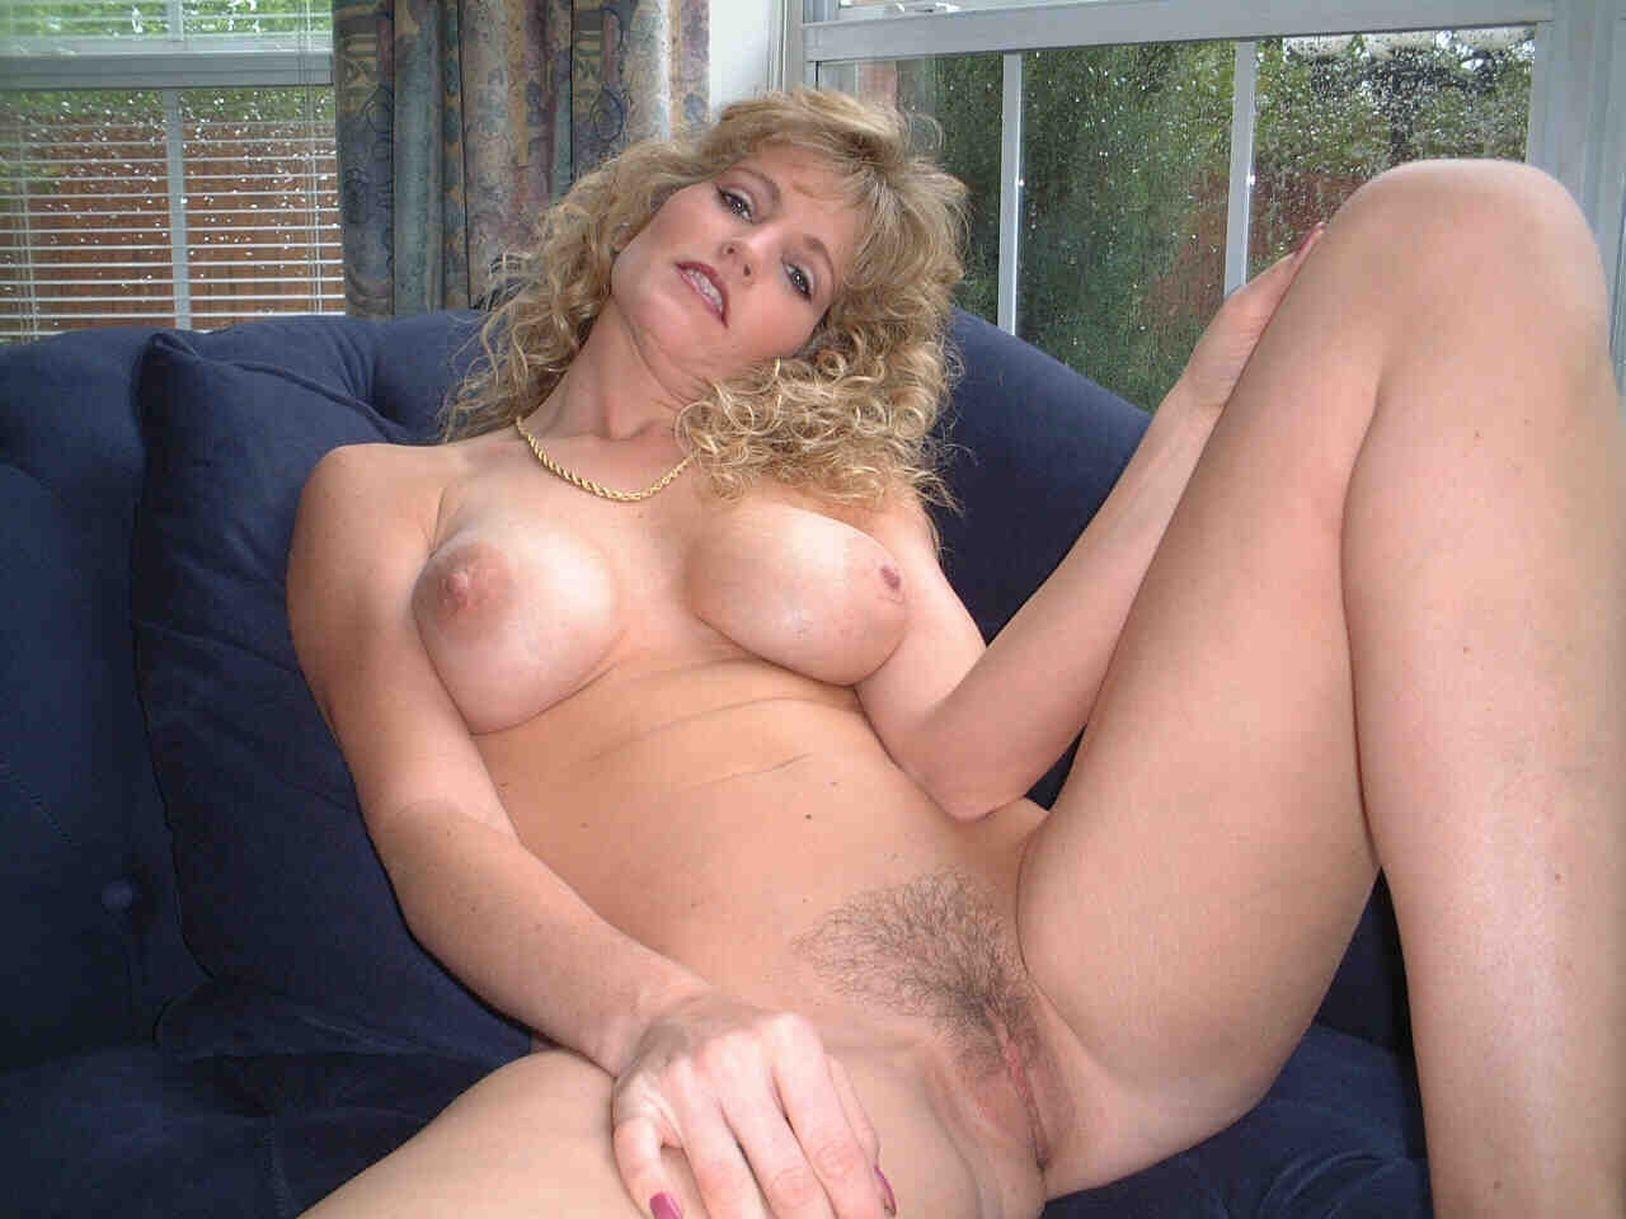 Mjores Milf Del Porno Actual fre milf chat . 42 new porn photos. comments: 3